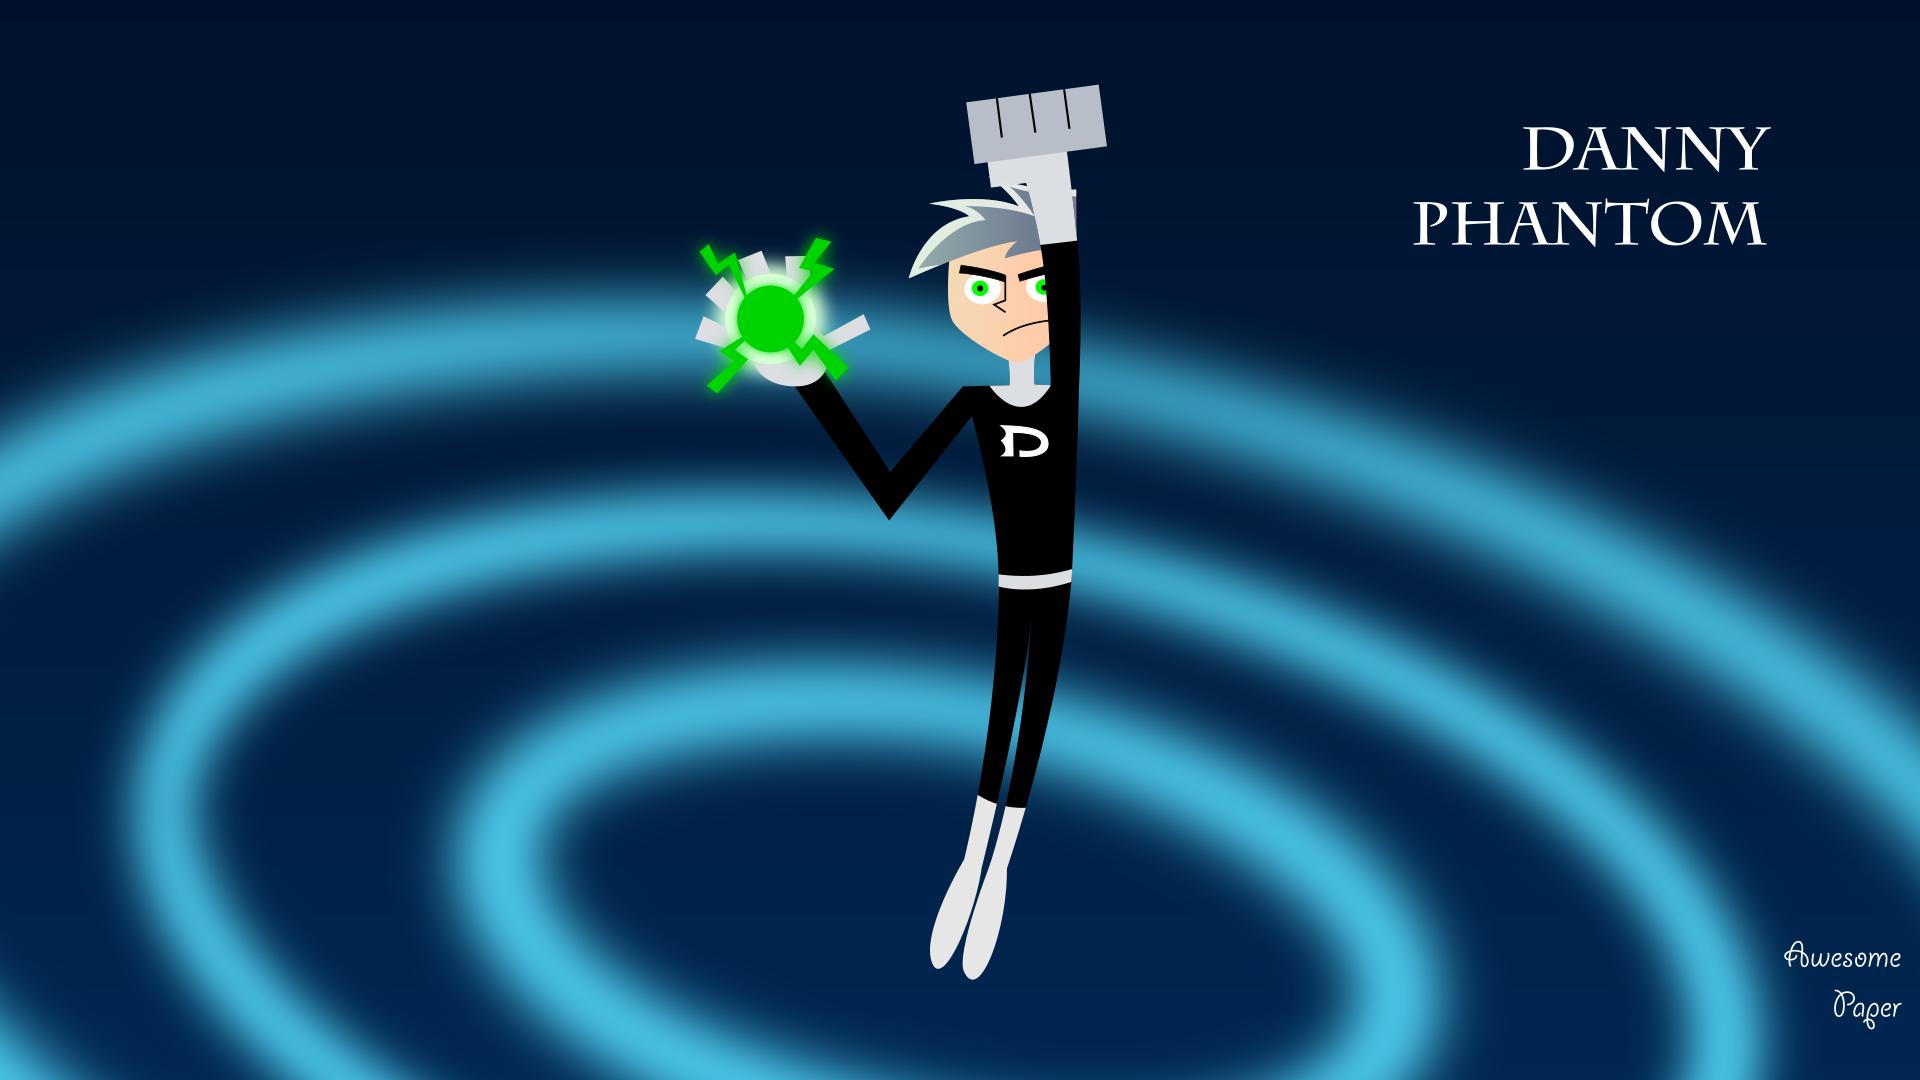 danny phantom danny phantom by awesomepaper on deviantart